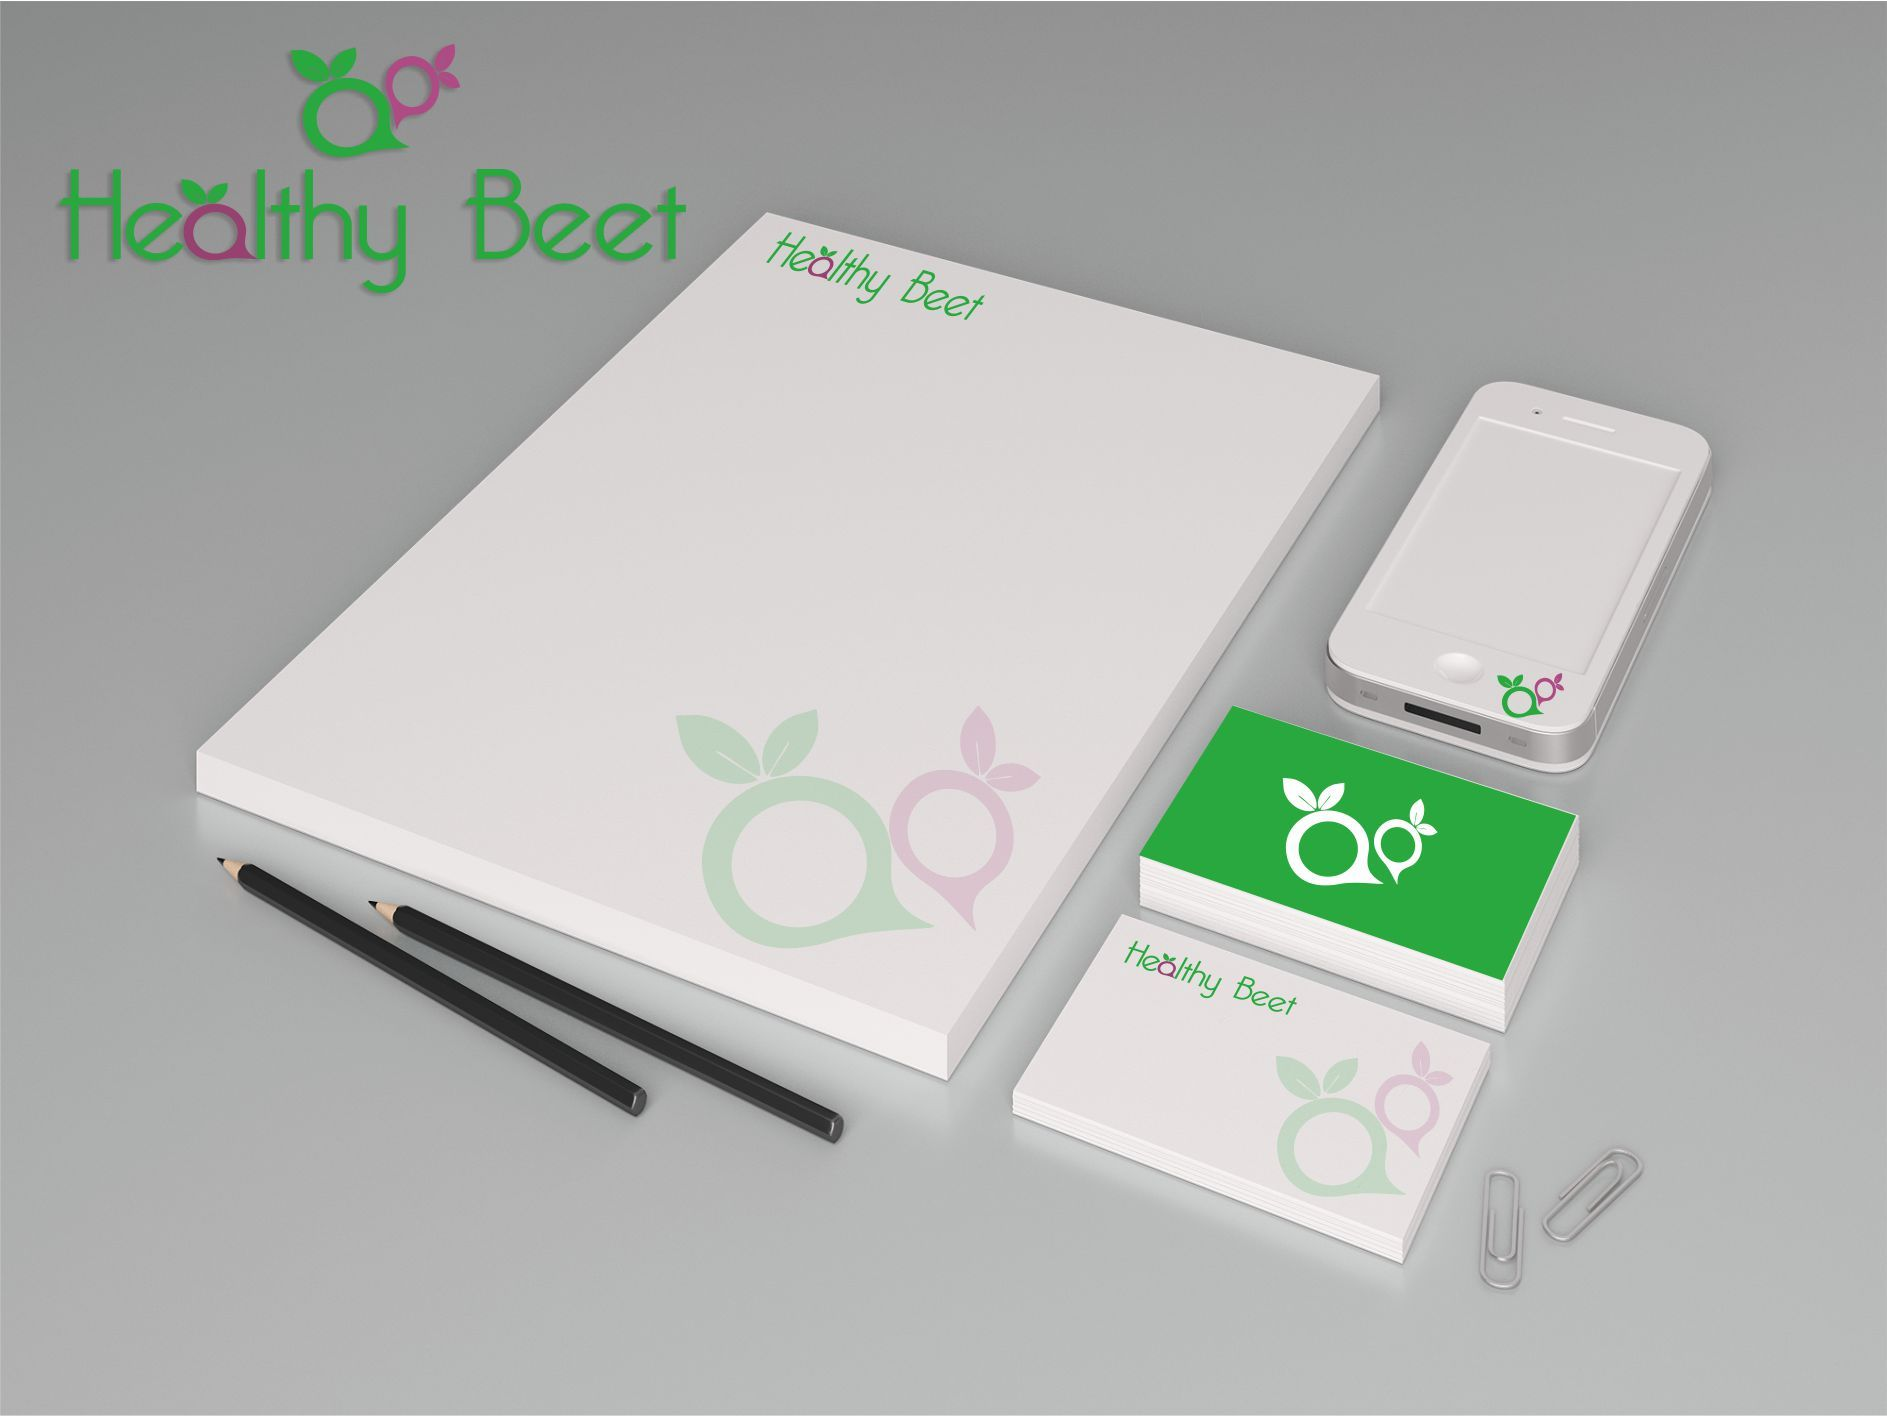 Healthy Bit или Healthy Beet - дизайнер dbyjuhfl